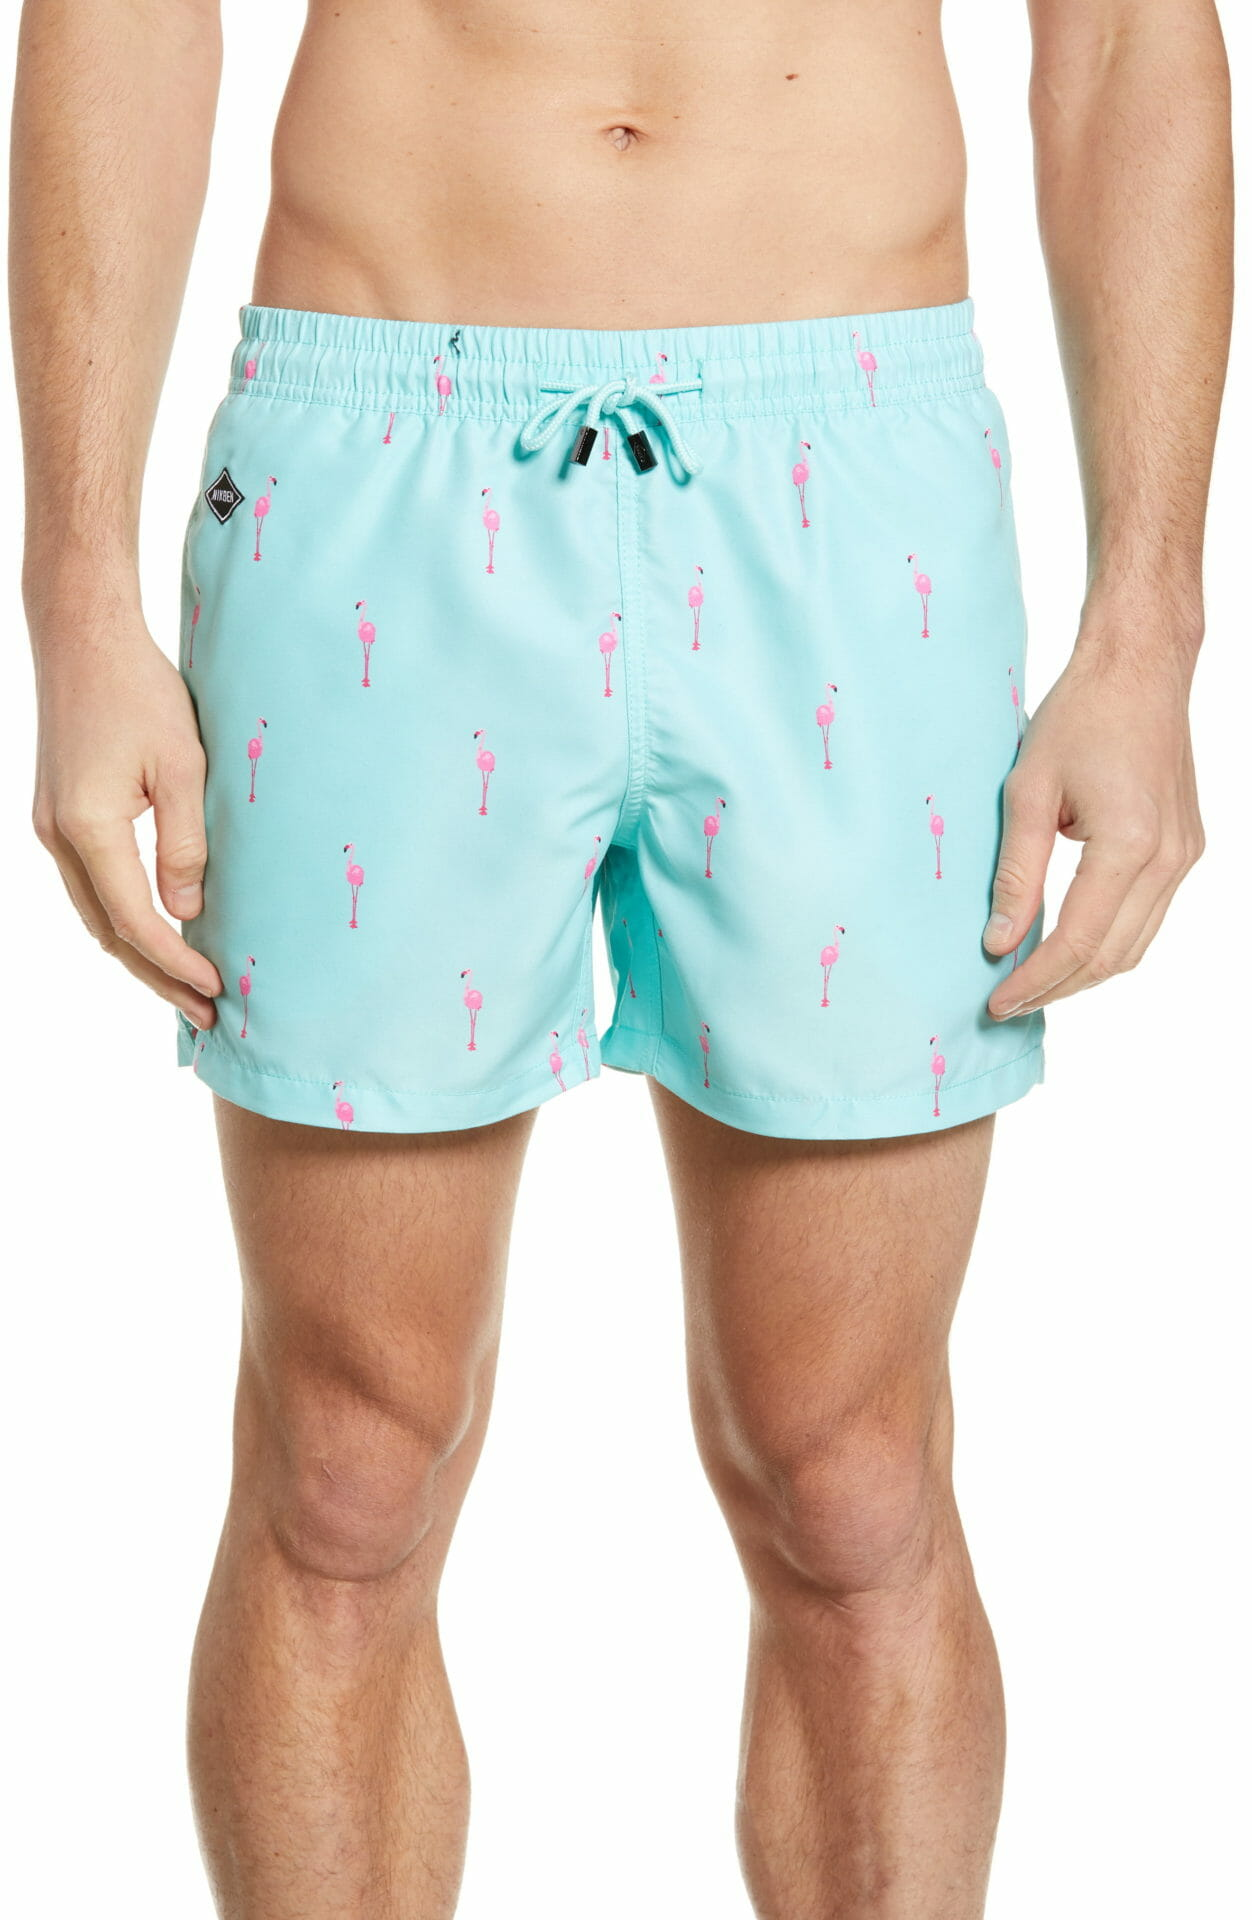 NIKBEN Flamingo Vice Swim Trunks, Main, color, GREEN